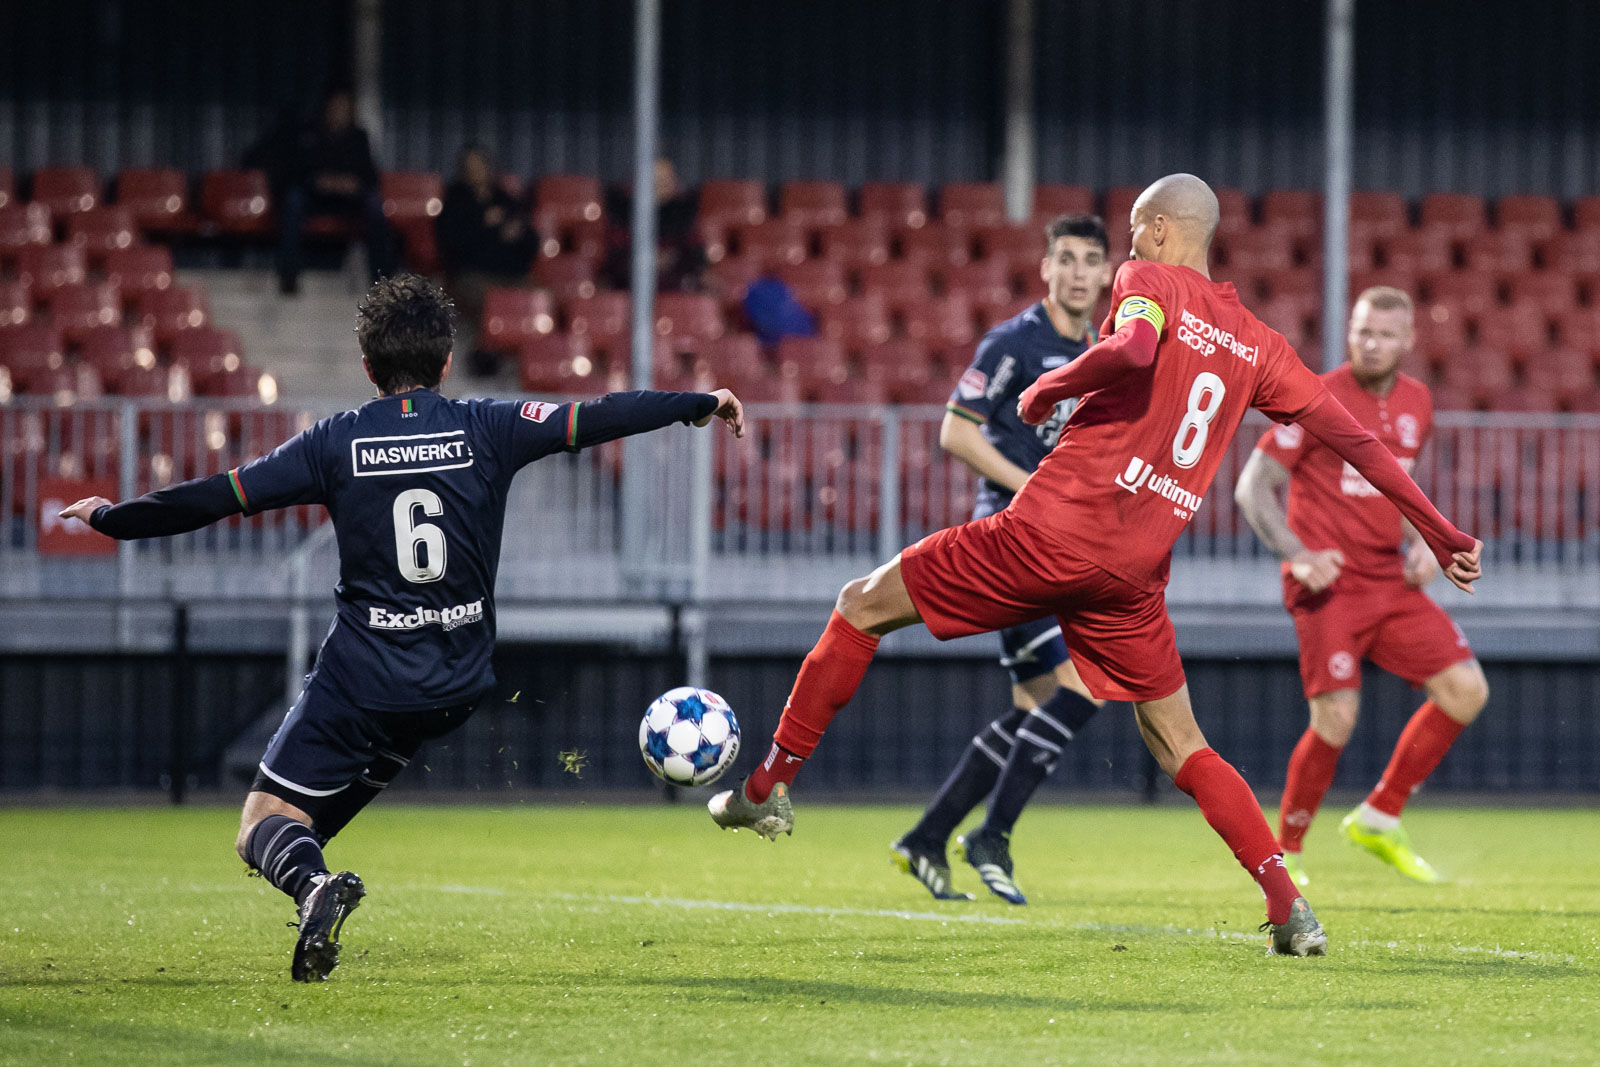 Almere City FC verliest in eerste ronde play-offs